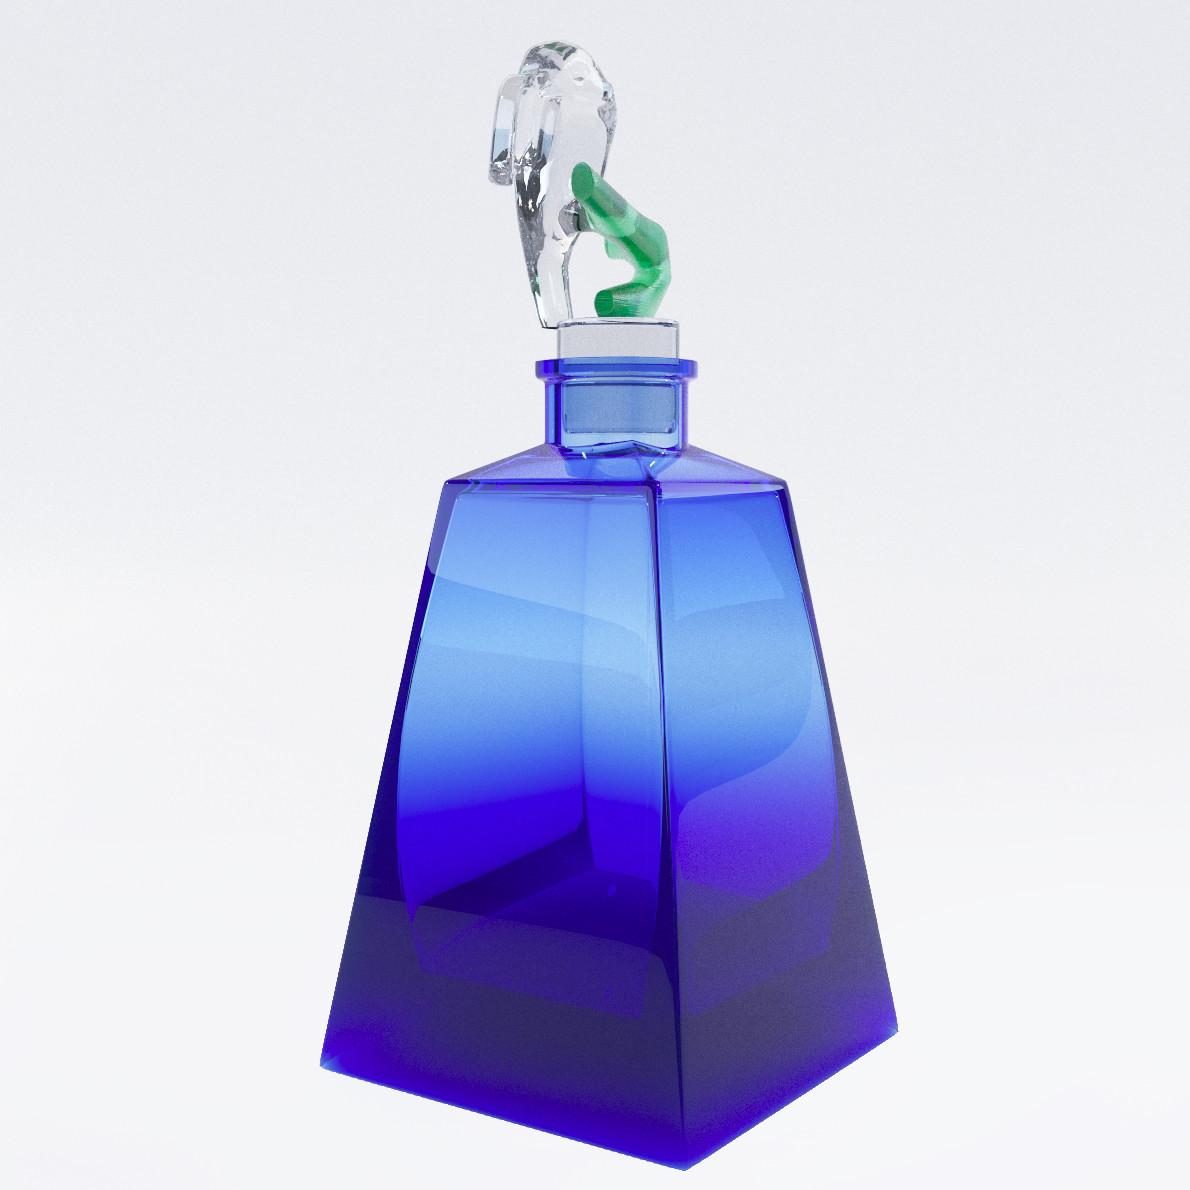 Bottle For Perfume 3d Realistic Model Artium3d